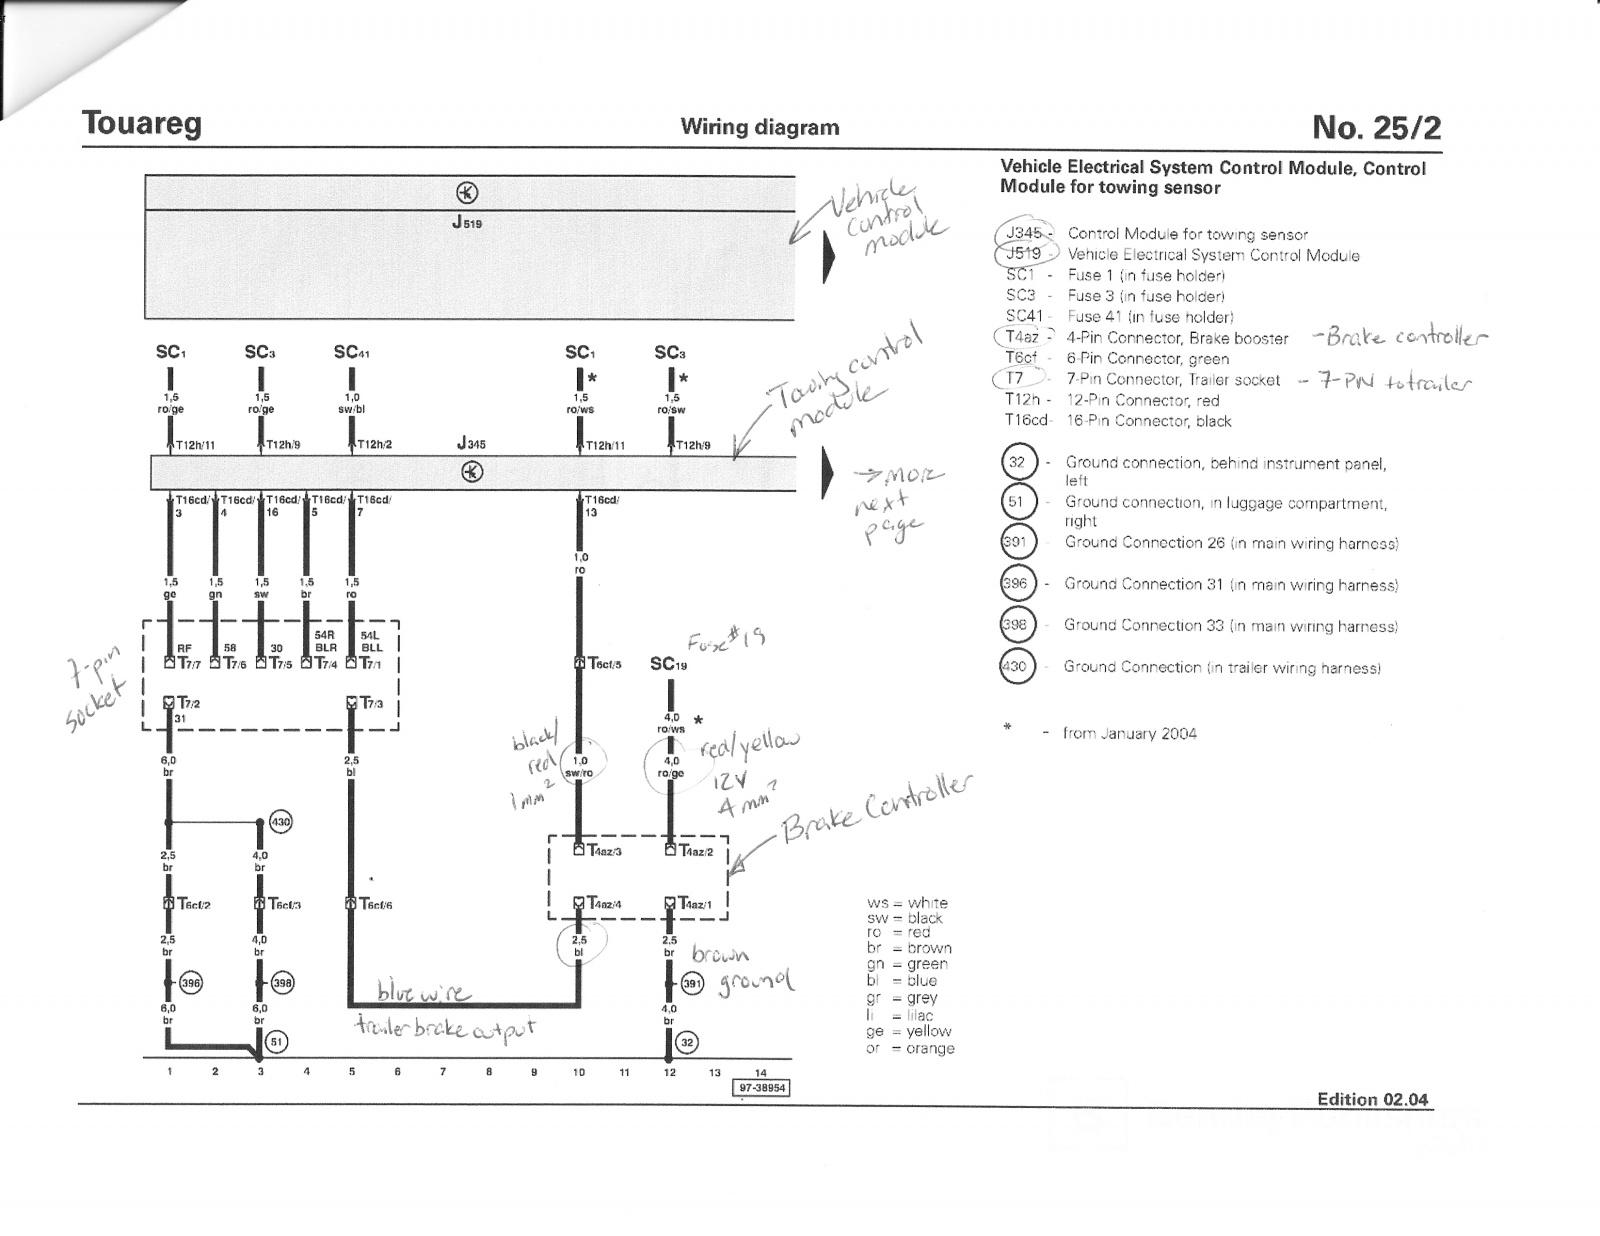 vw stereo wiring diagrams gantt charts for mac, Wiring diagram